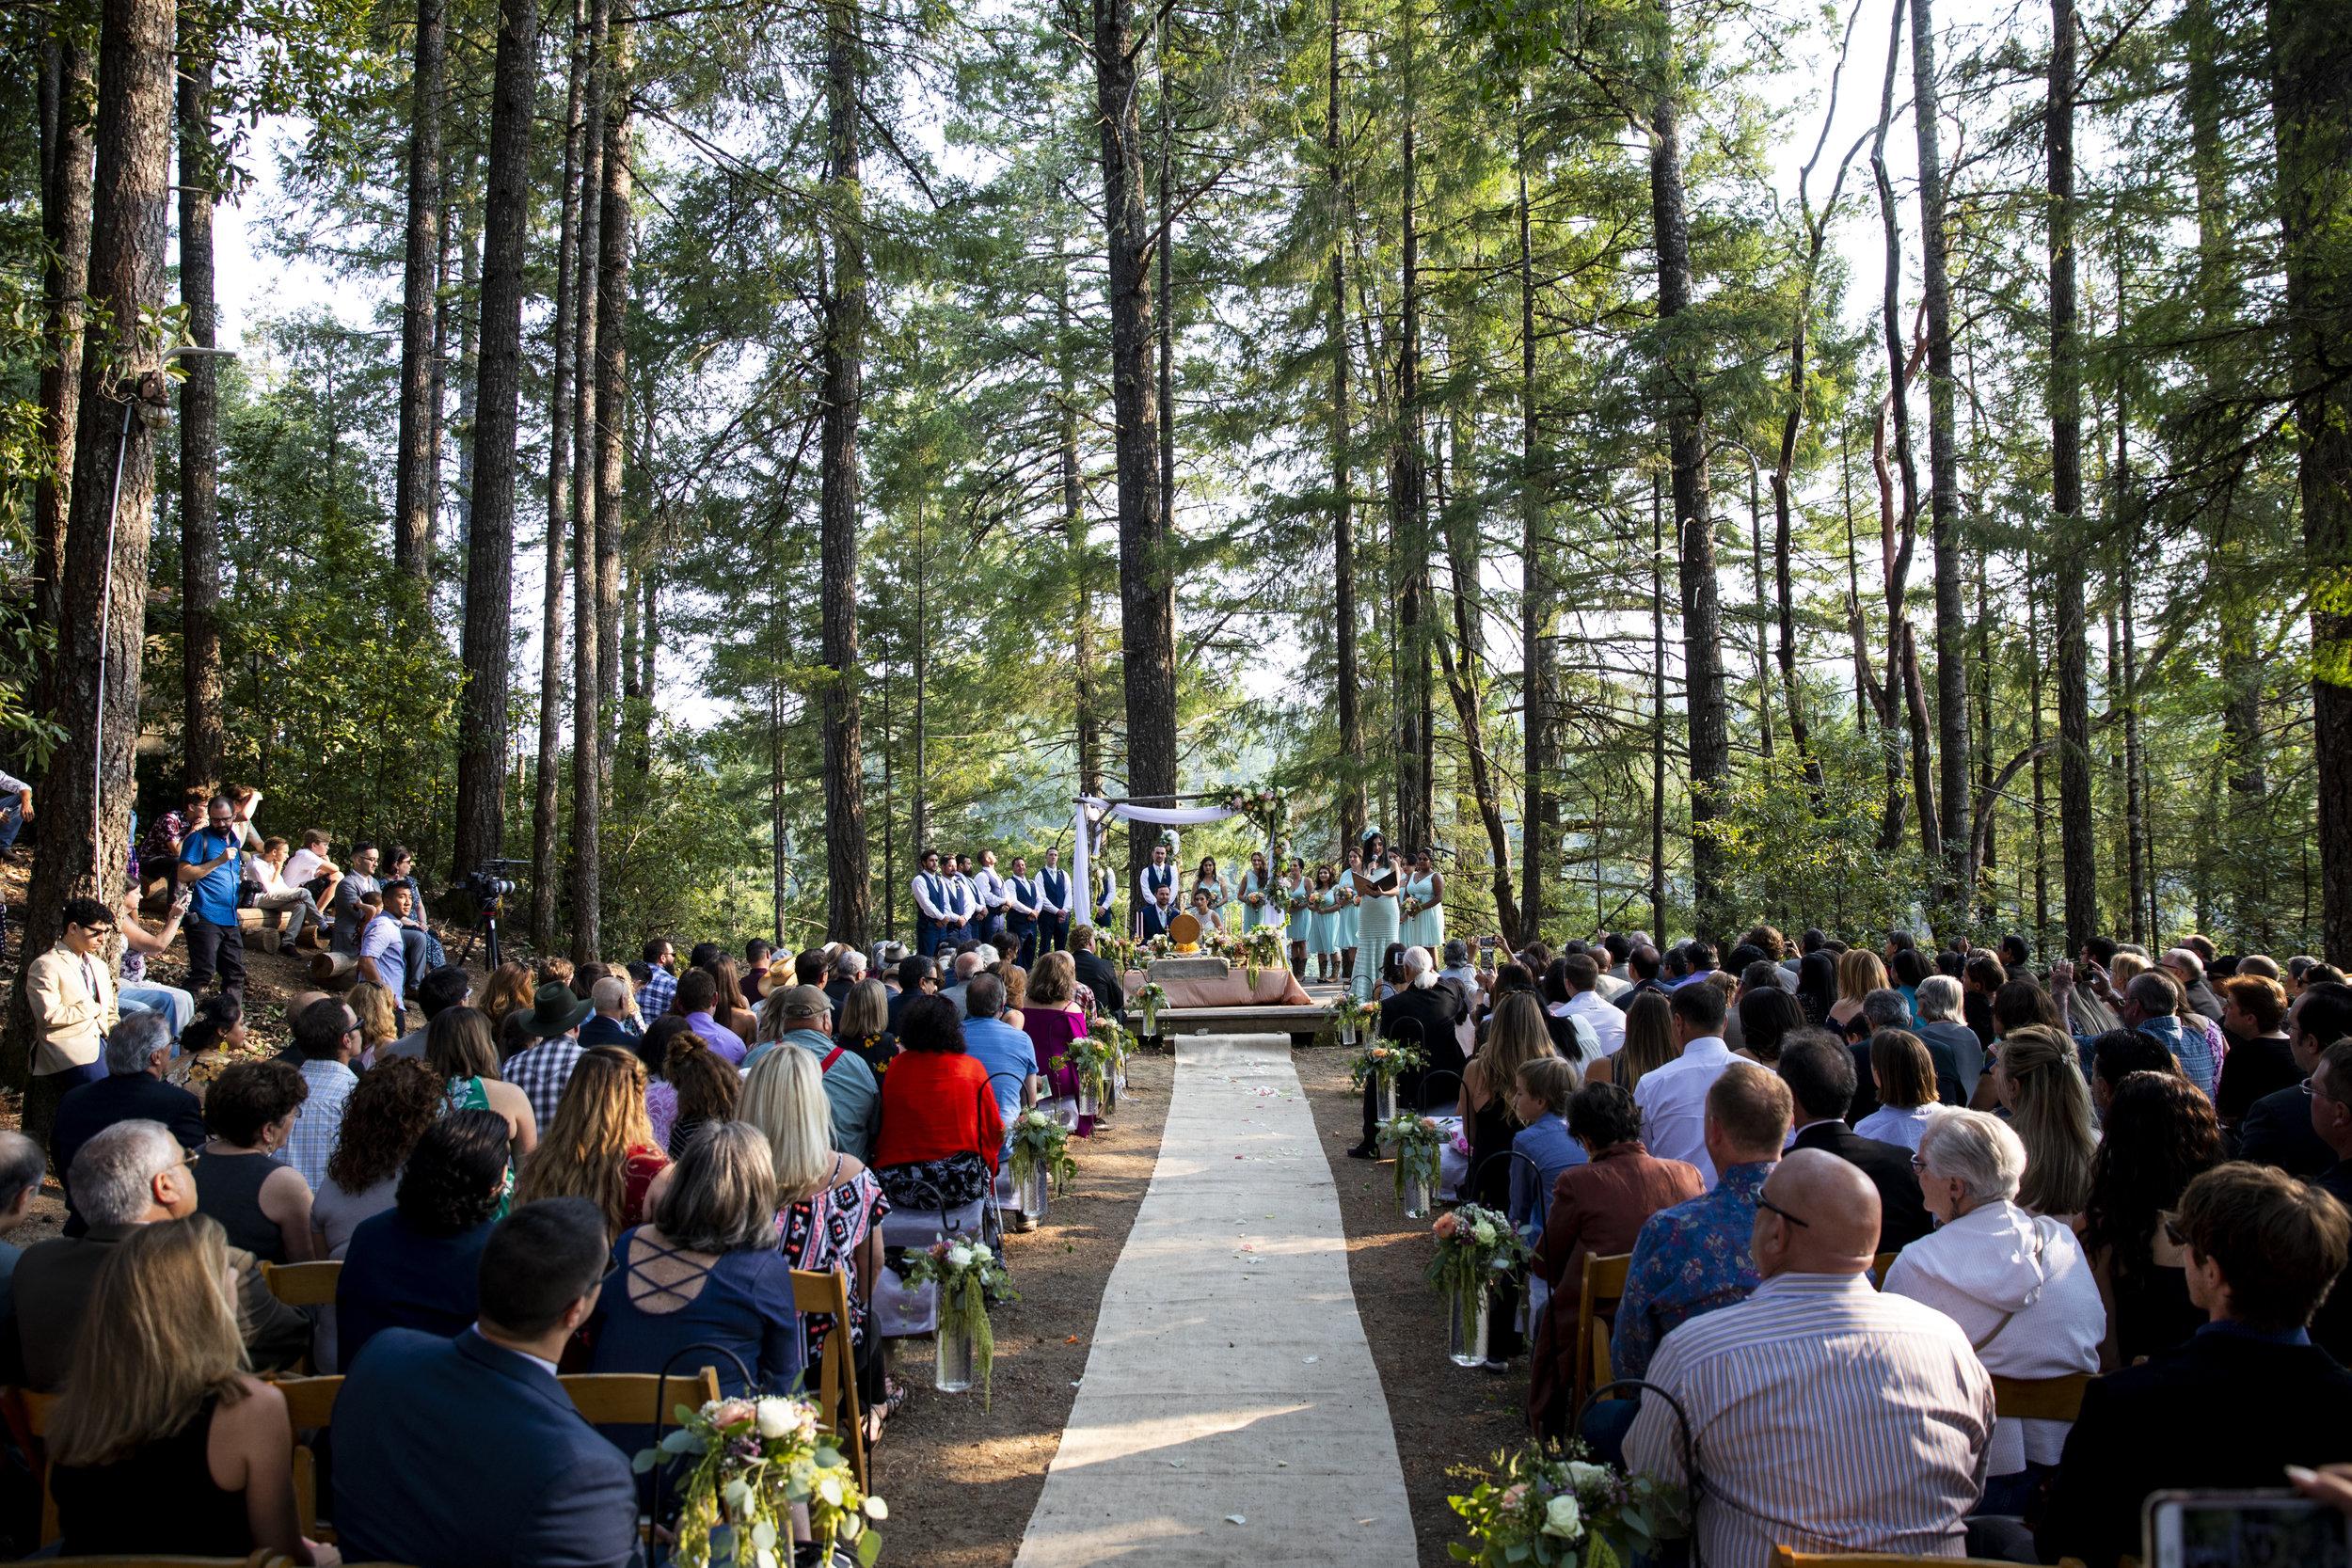 atoosa+dave_wedding_8_25_18_nzvolensky-325.jpg